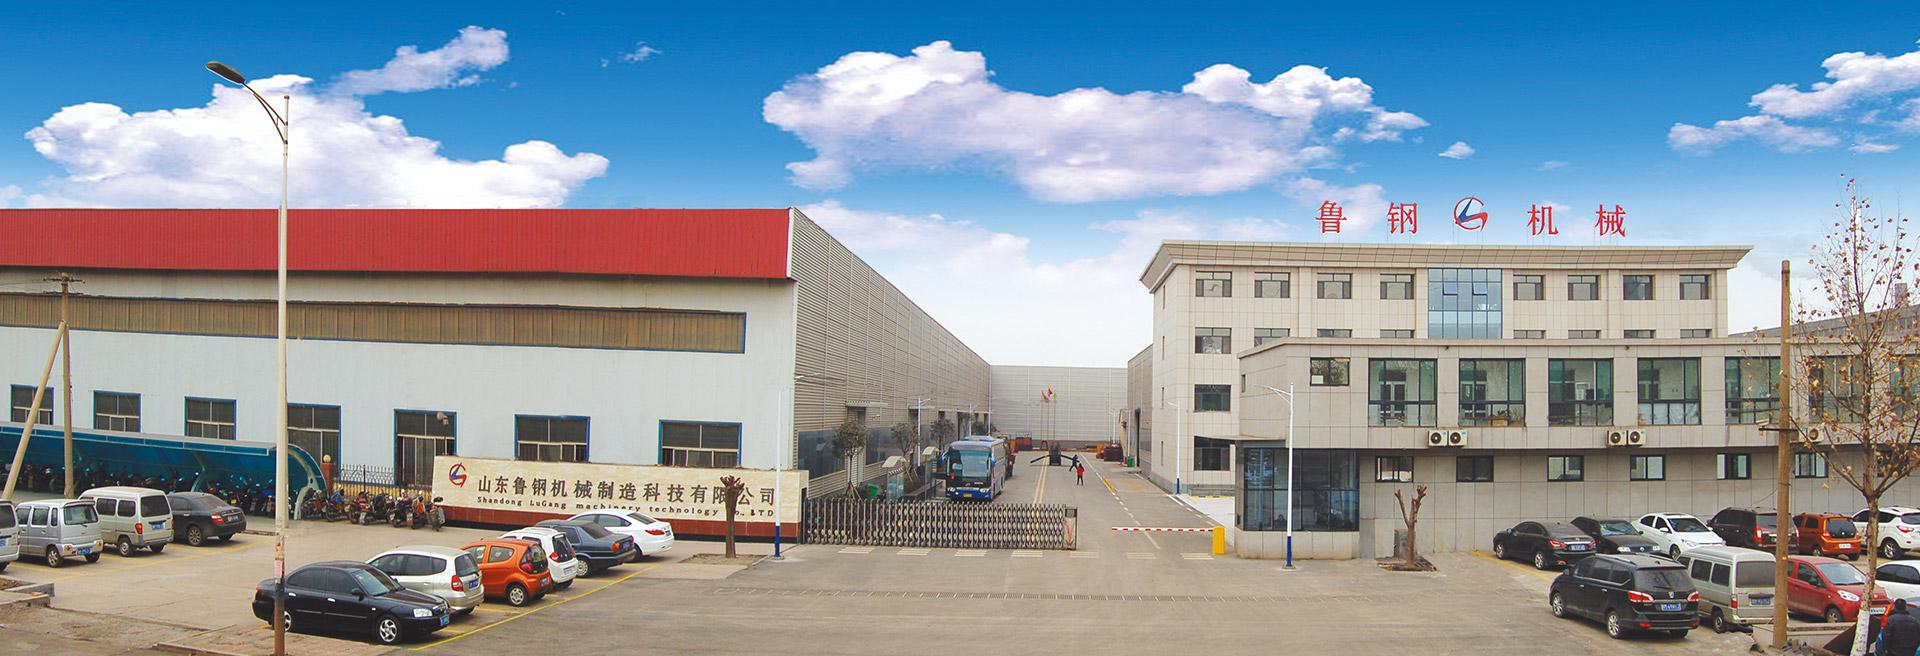 Shandong Lugang Machinery Manufacturing Technology Co., Ltd